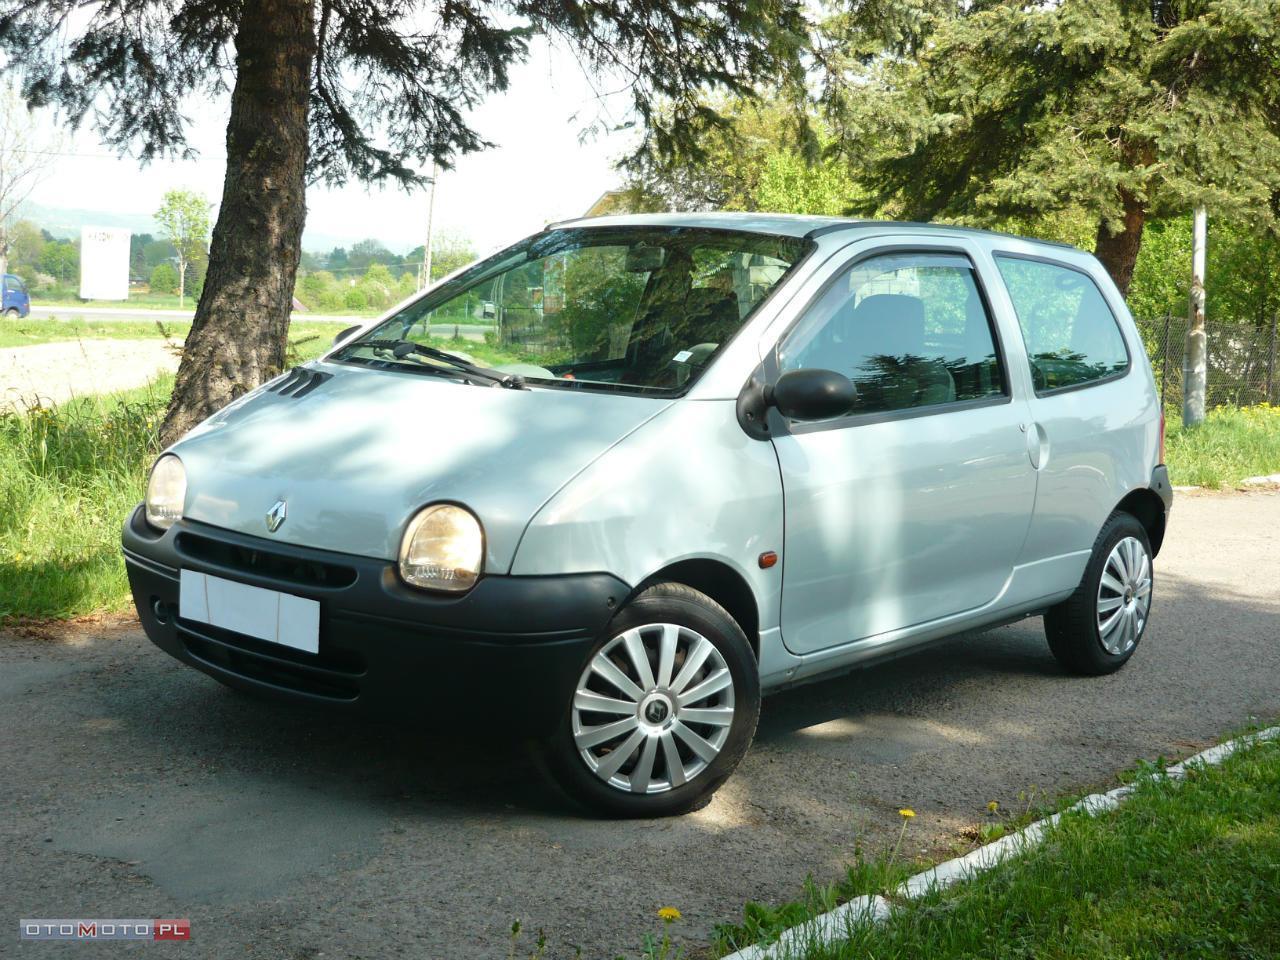 Renault Twingo ZADBANY!